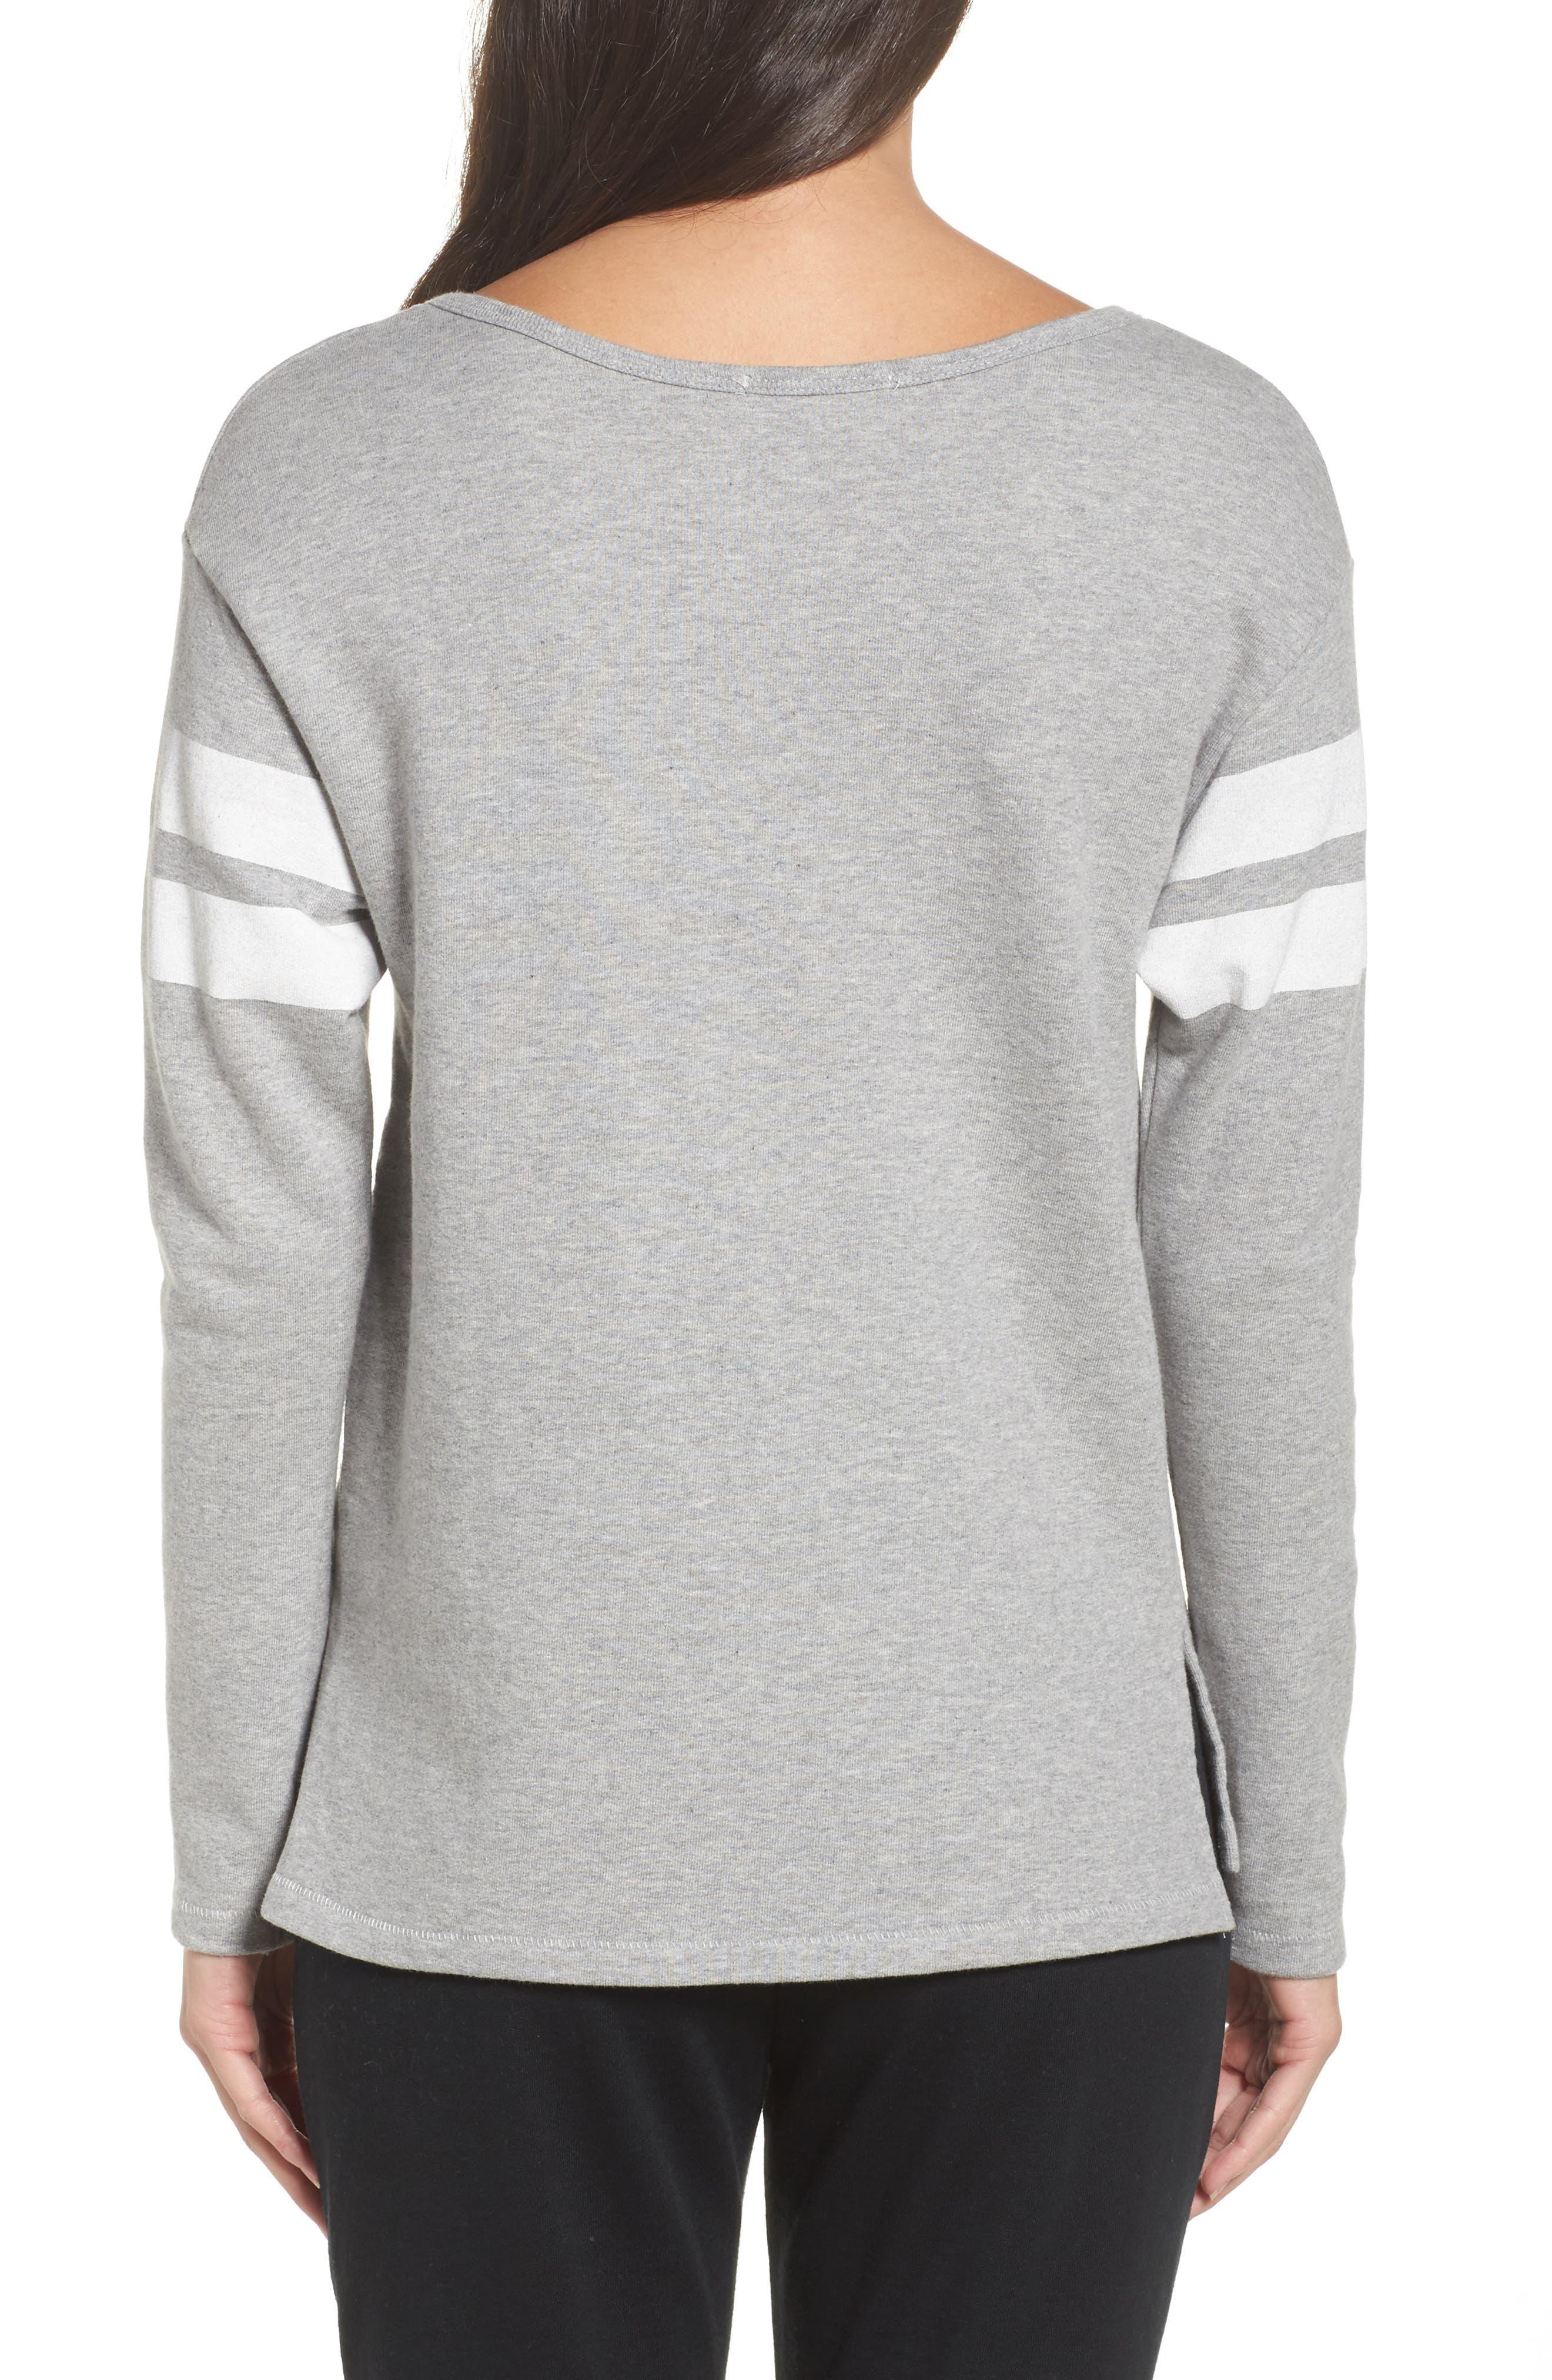 NFL New York Giants Champion Sweatshirt,                             Alternate thumbnail 2, color,                             Grey